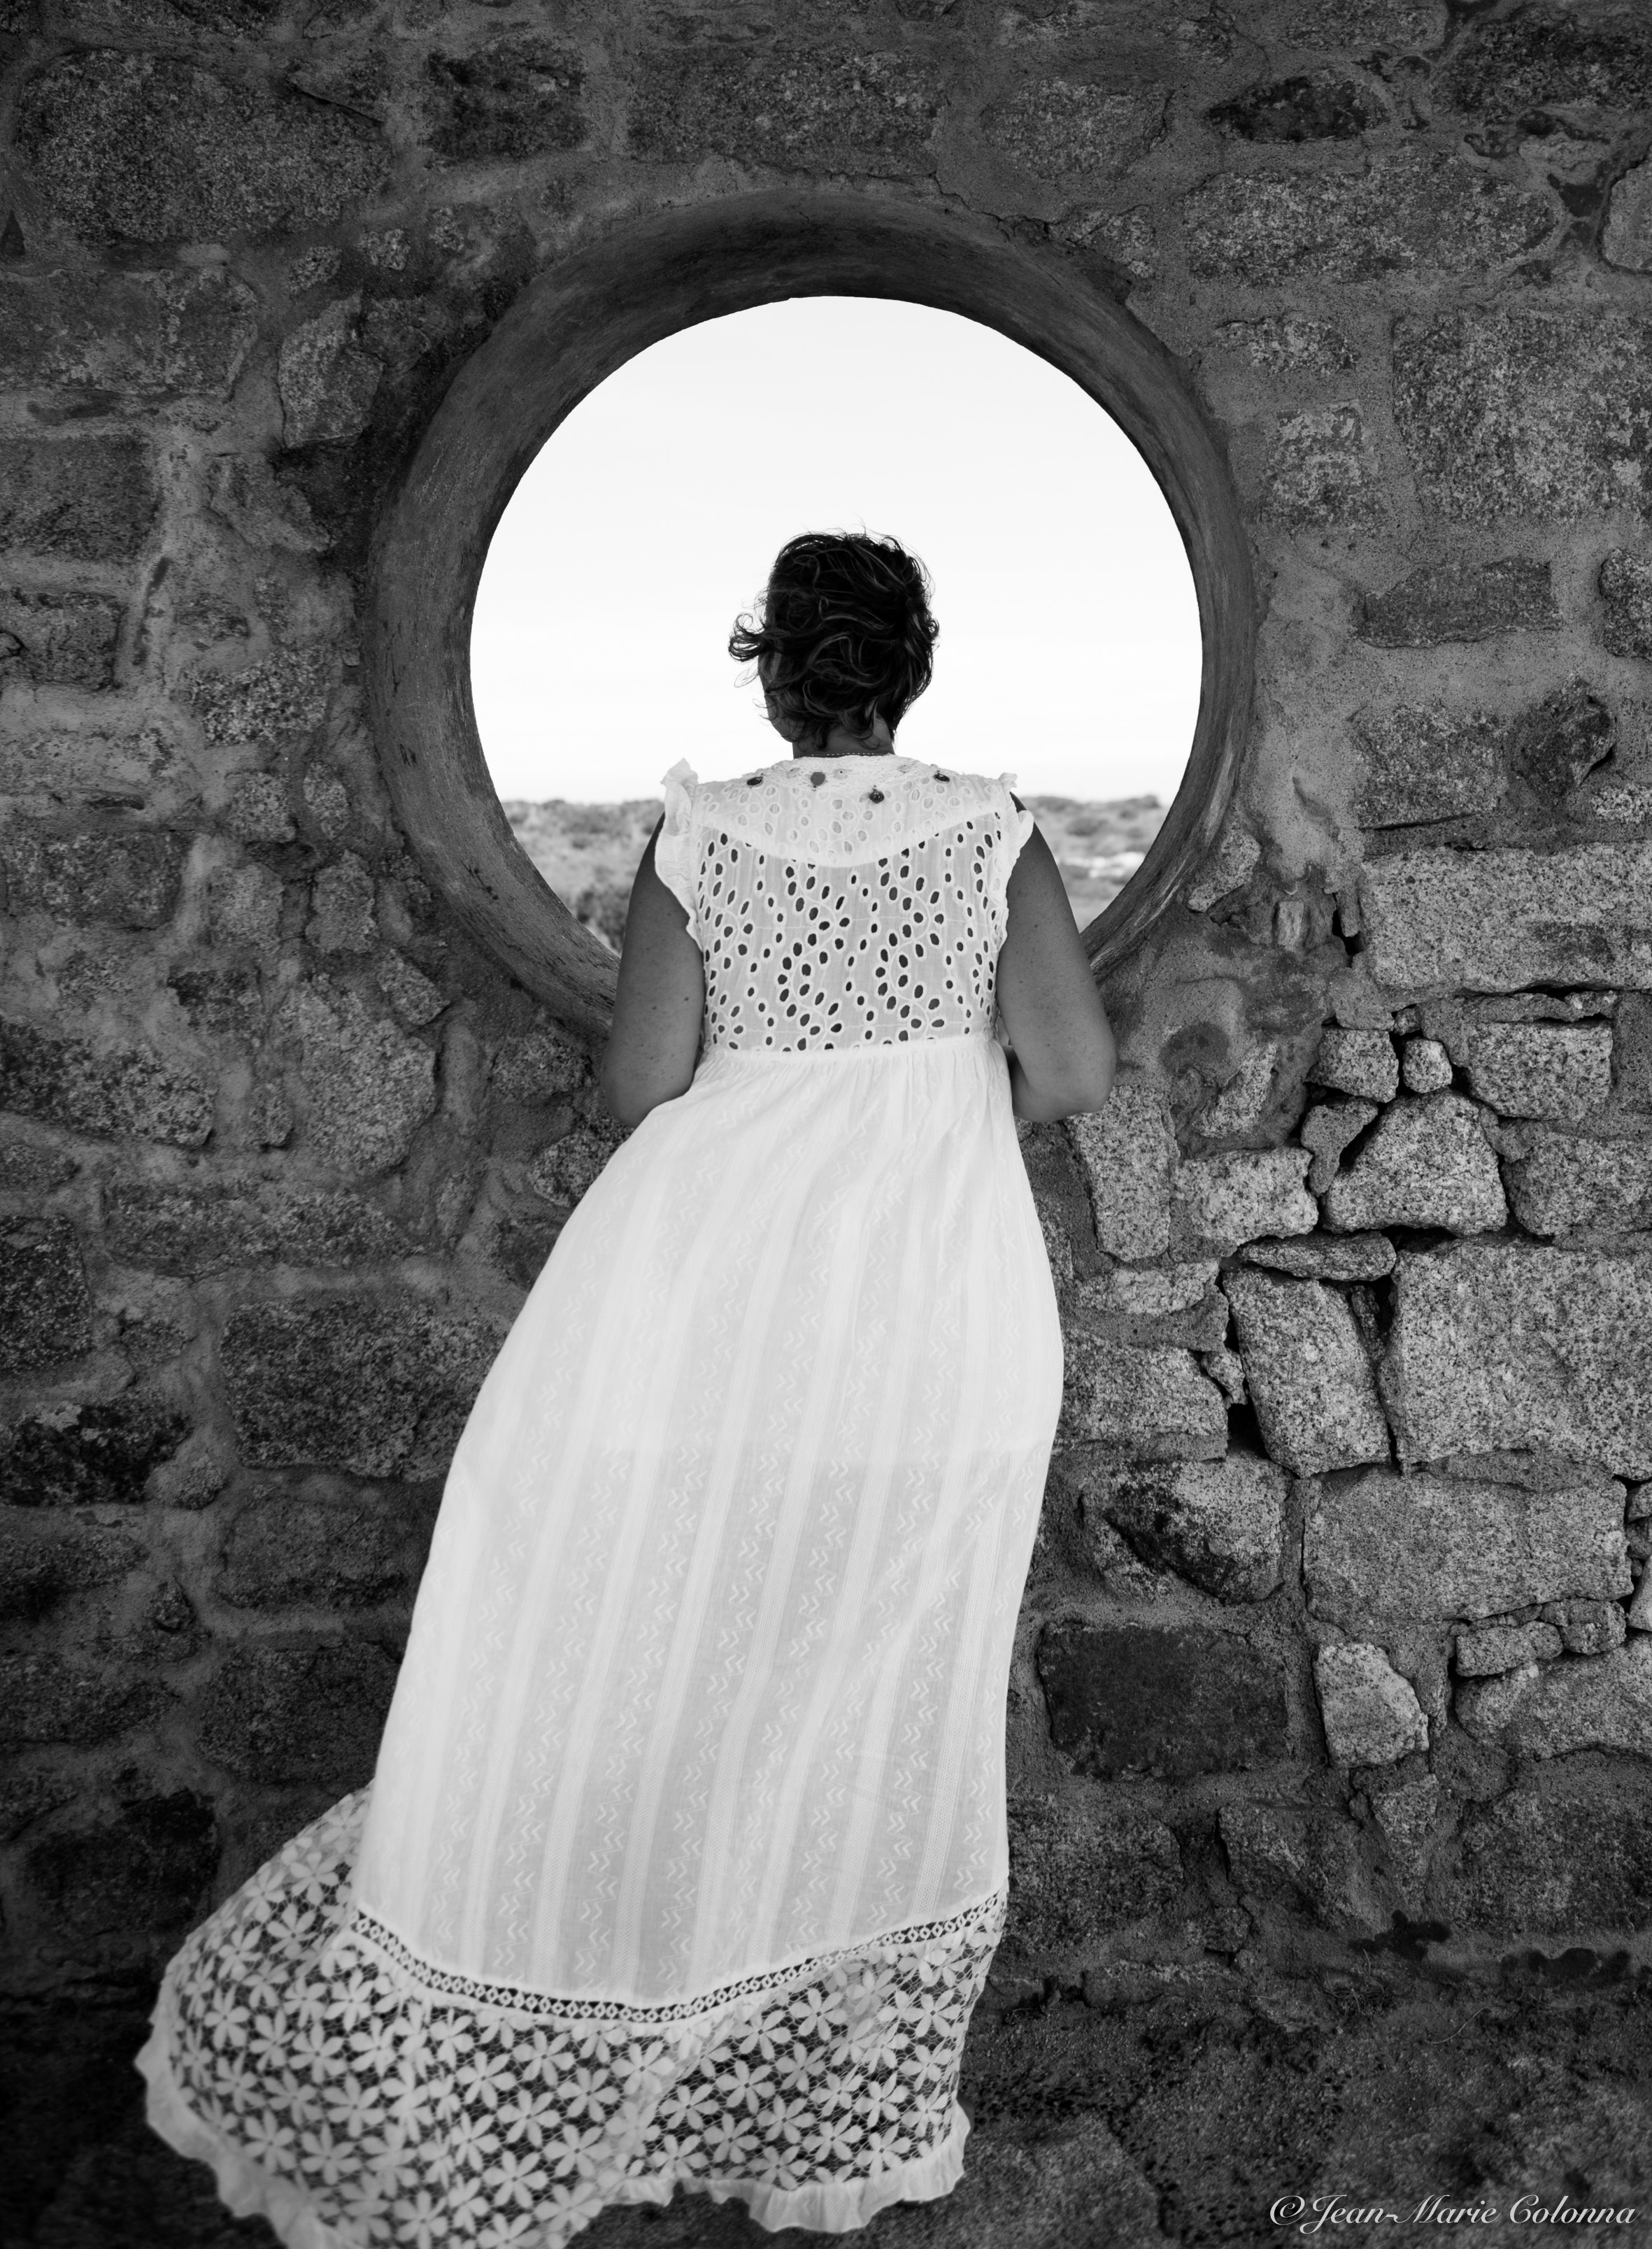 ©Jean-Marie_Colonna-8160